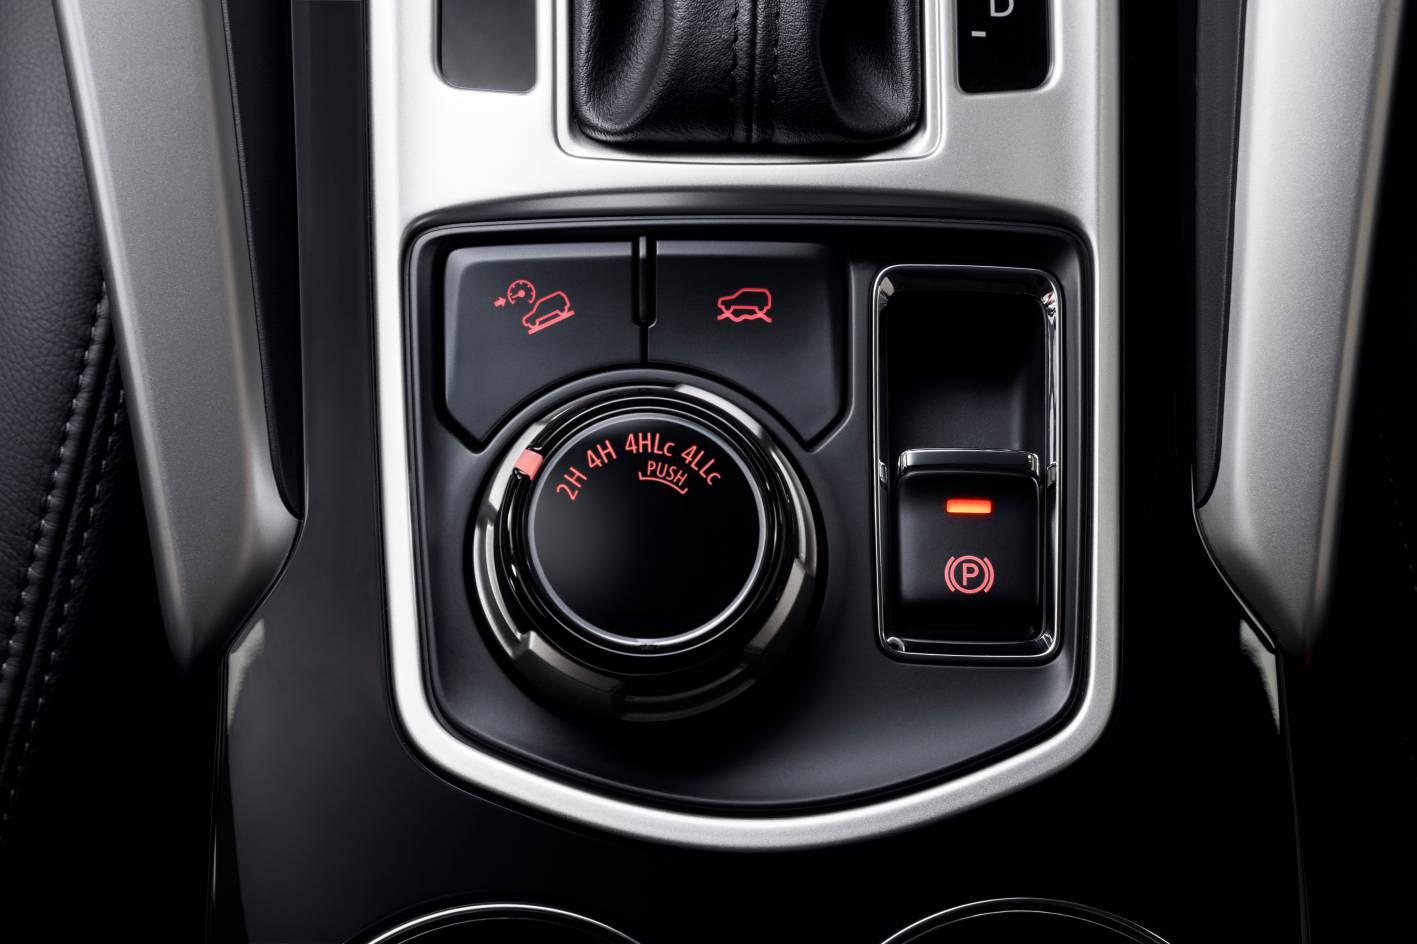 2016 Mitsubishi Pajero Sport Review & Road Test